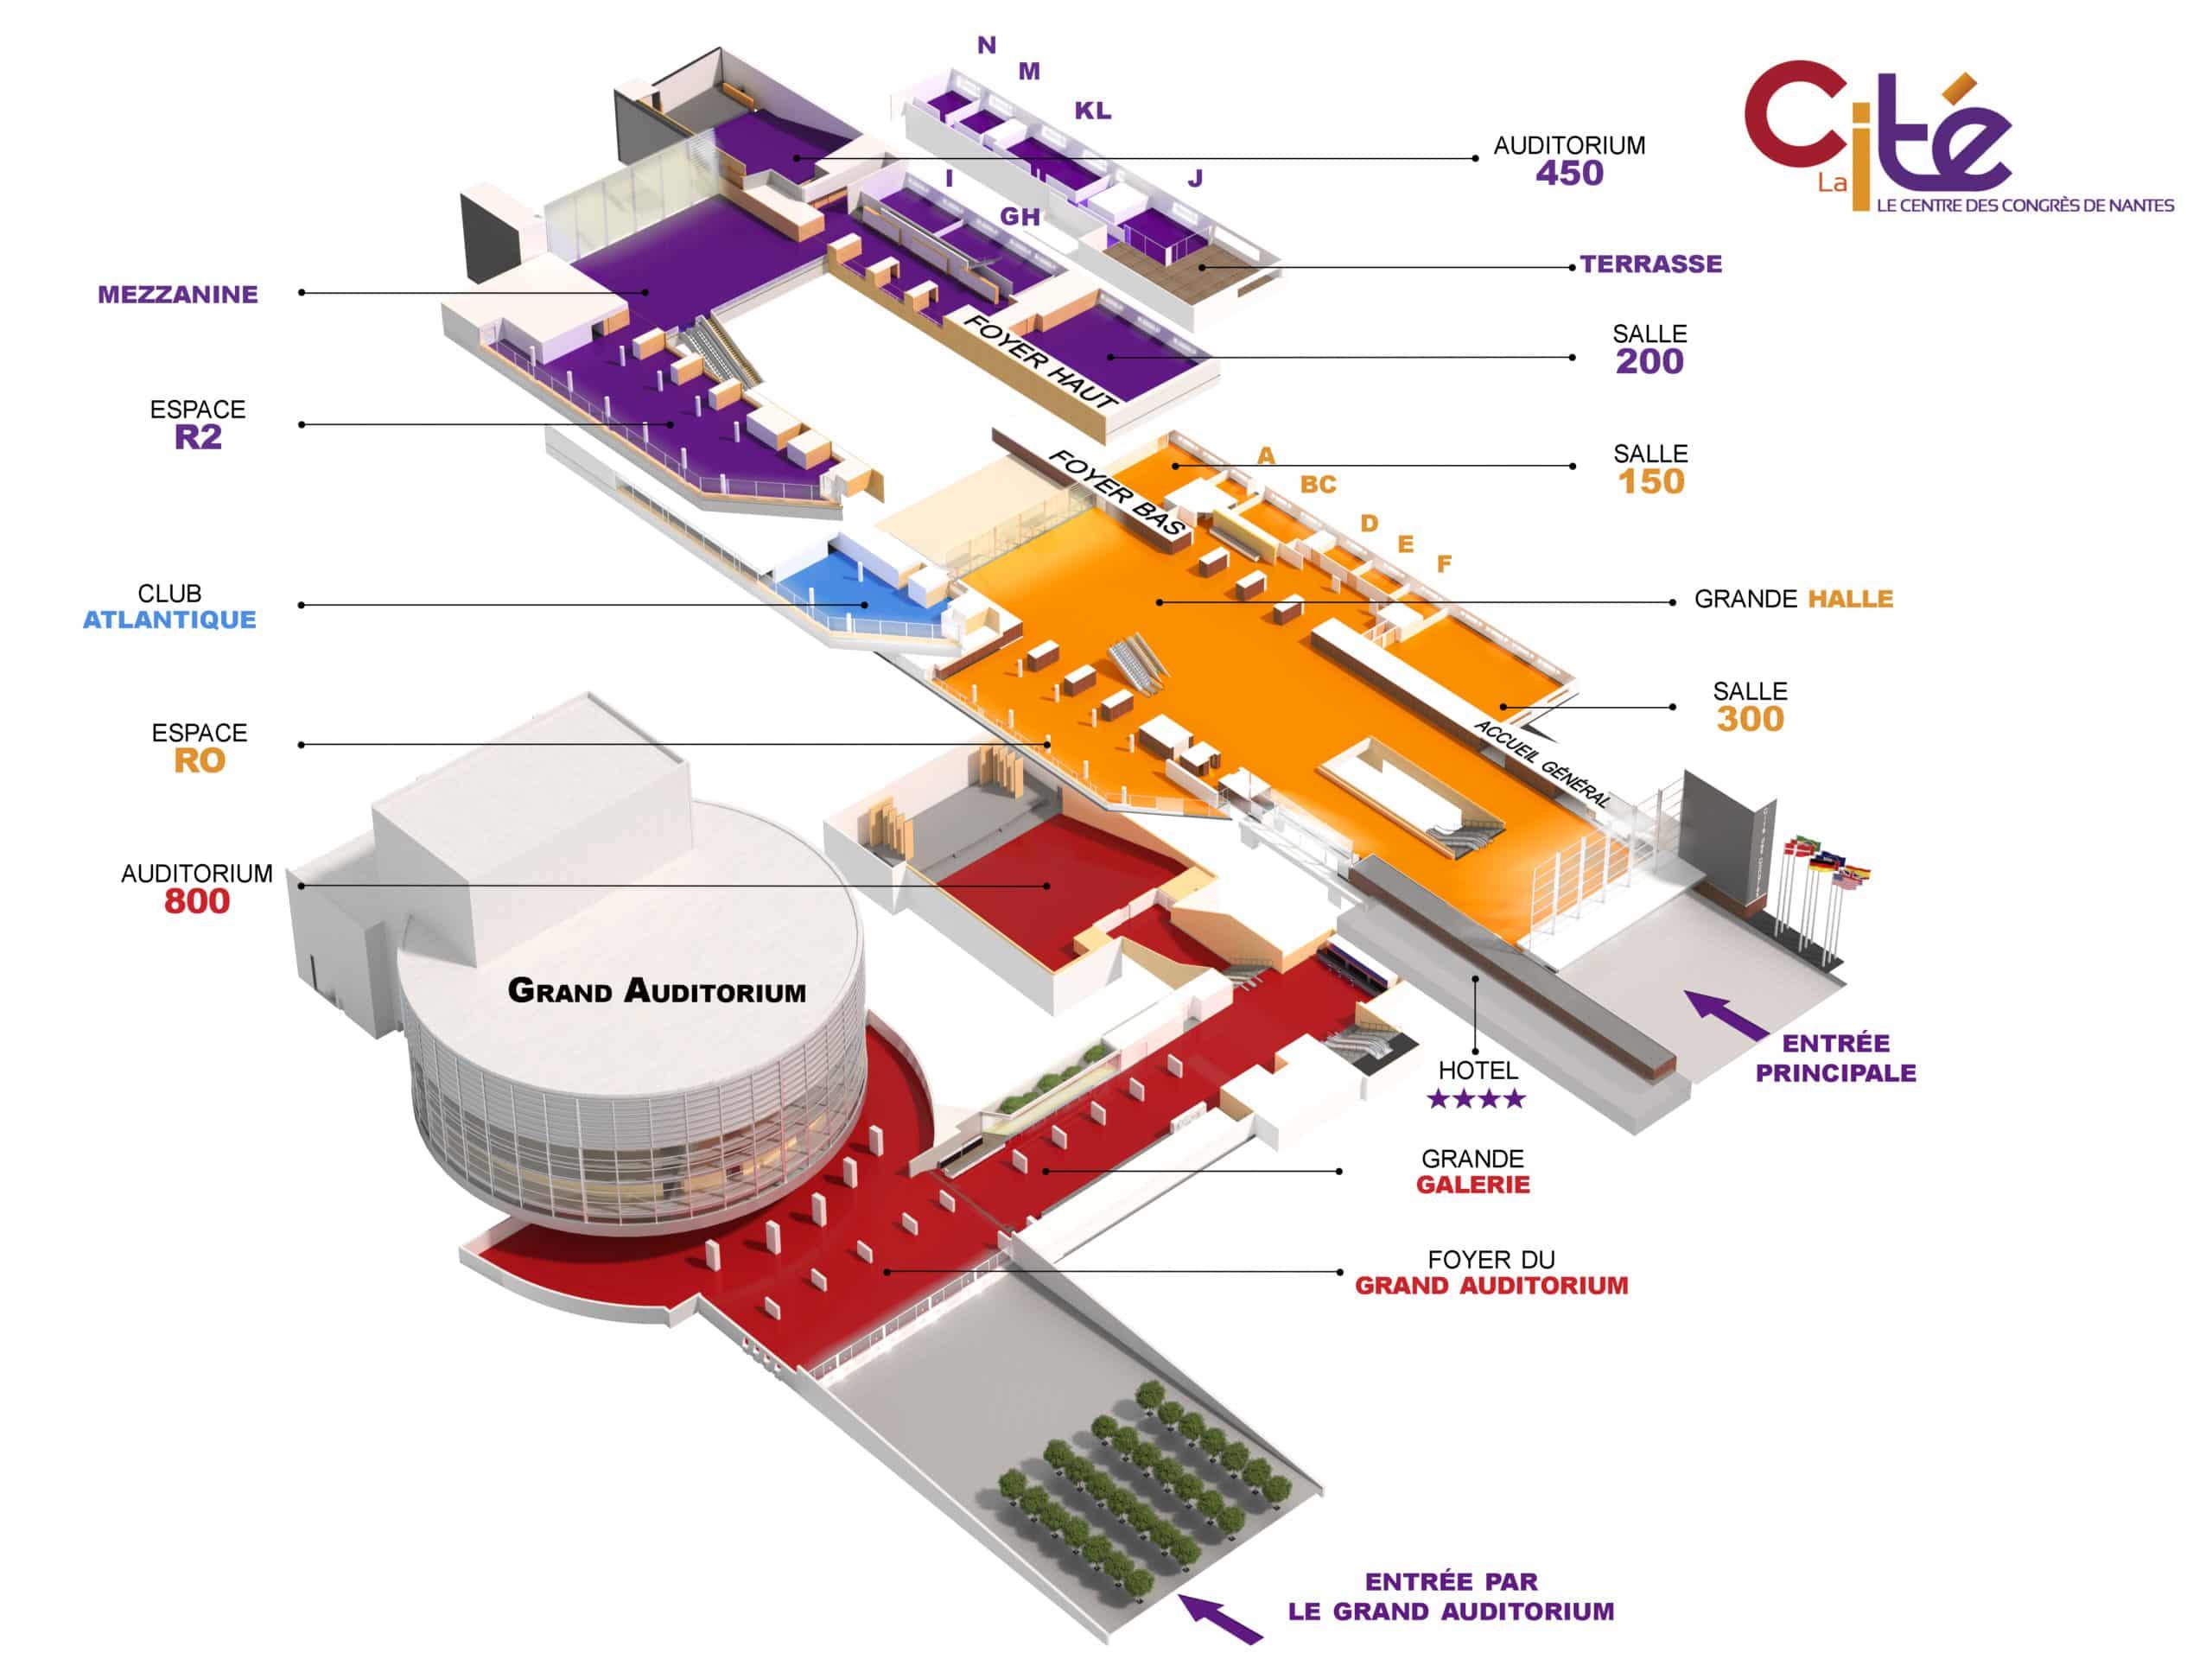 Plan Des Salles De La Cite Congres Nantes